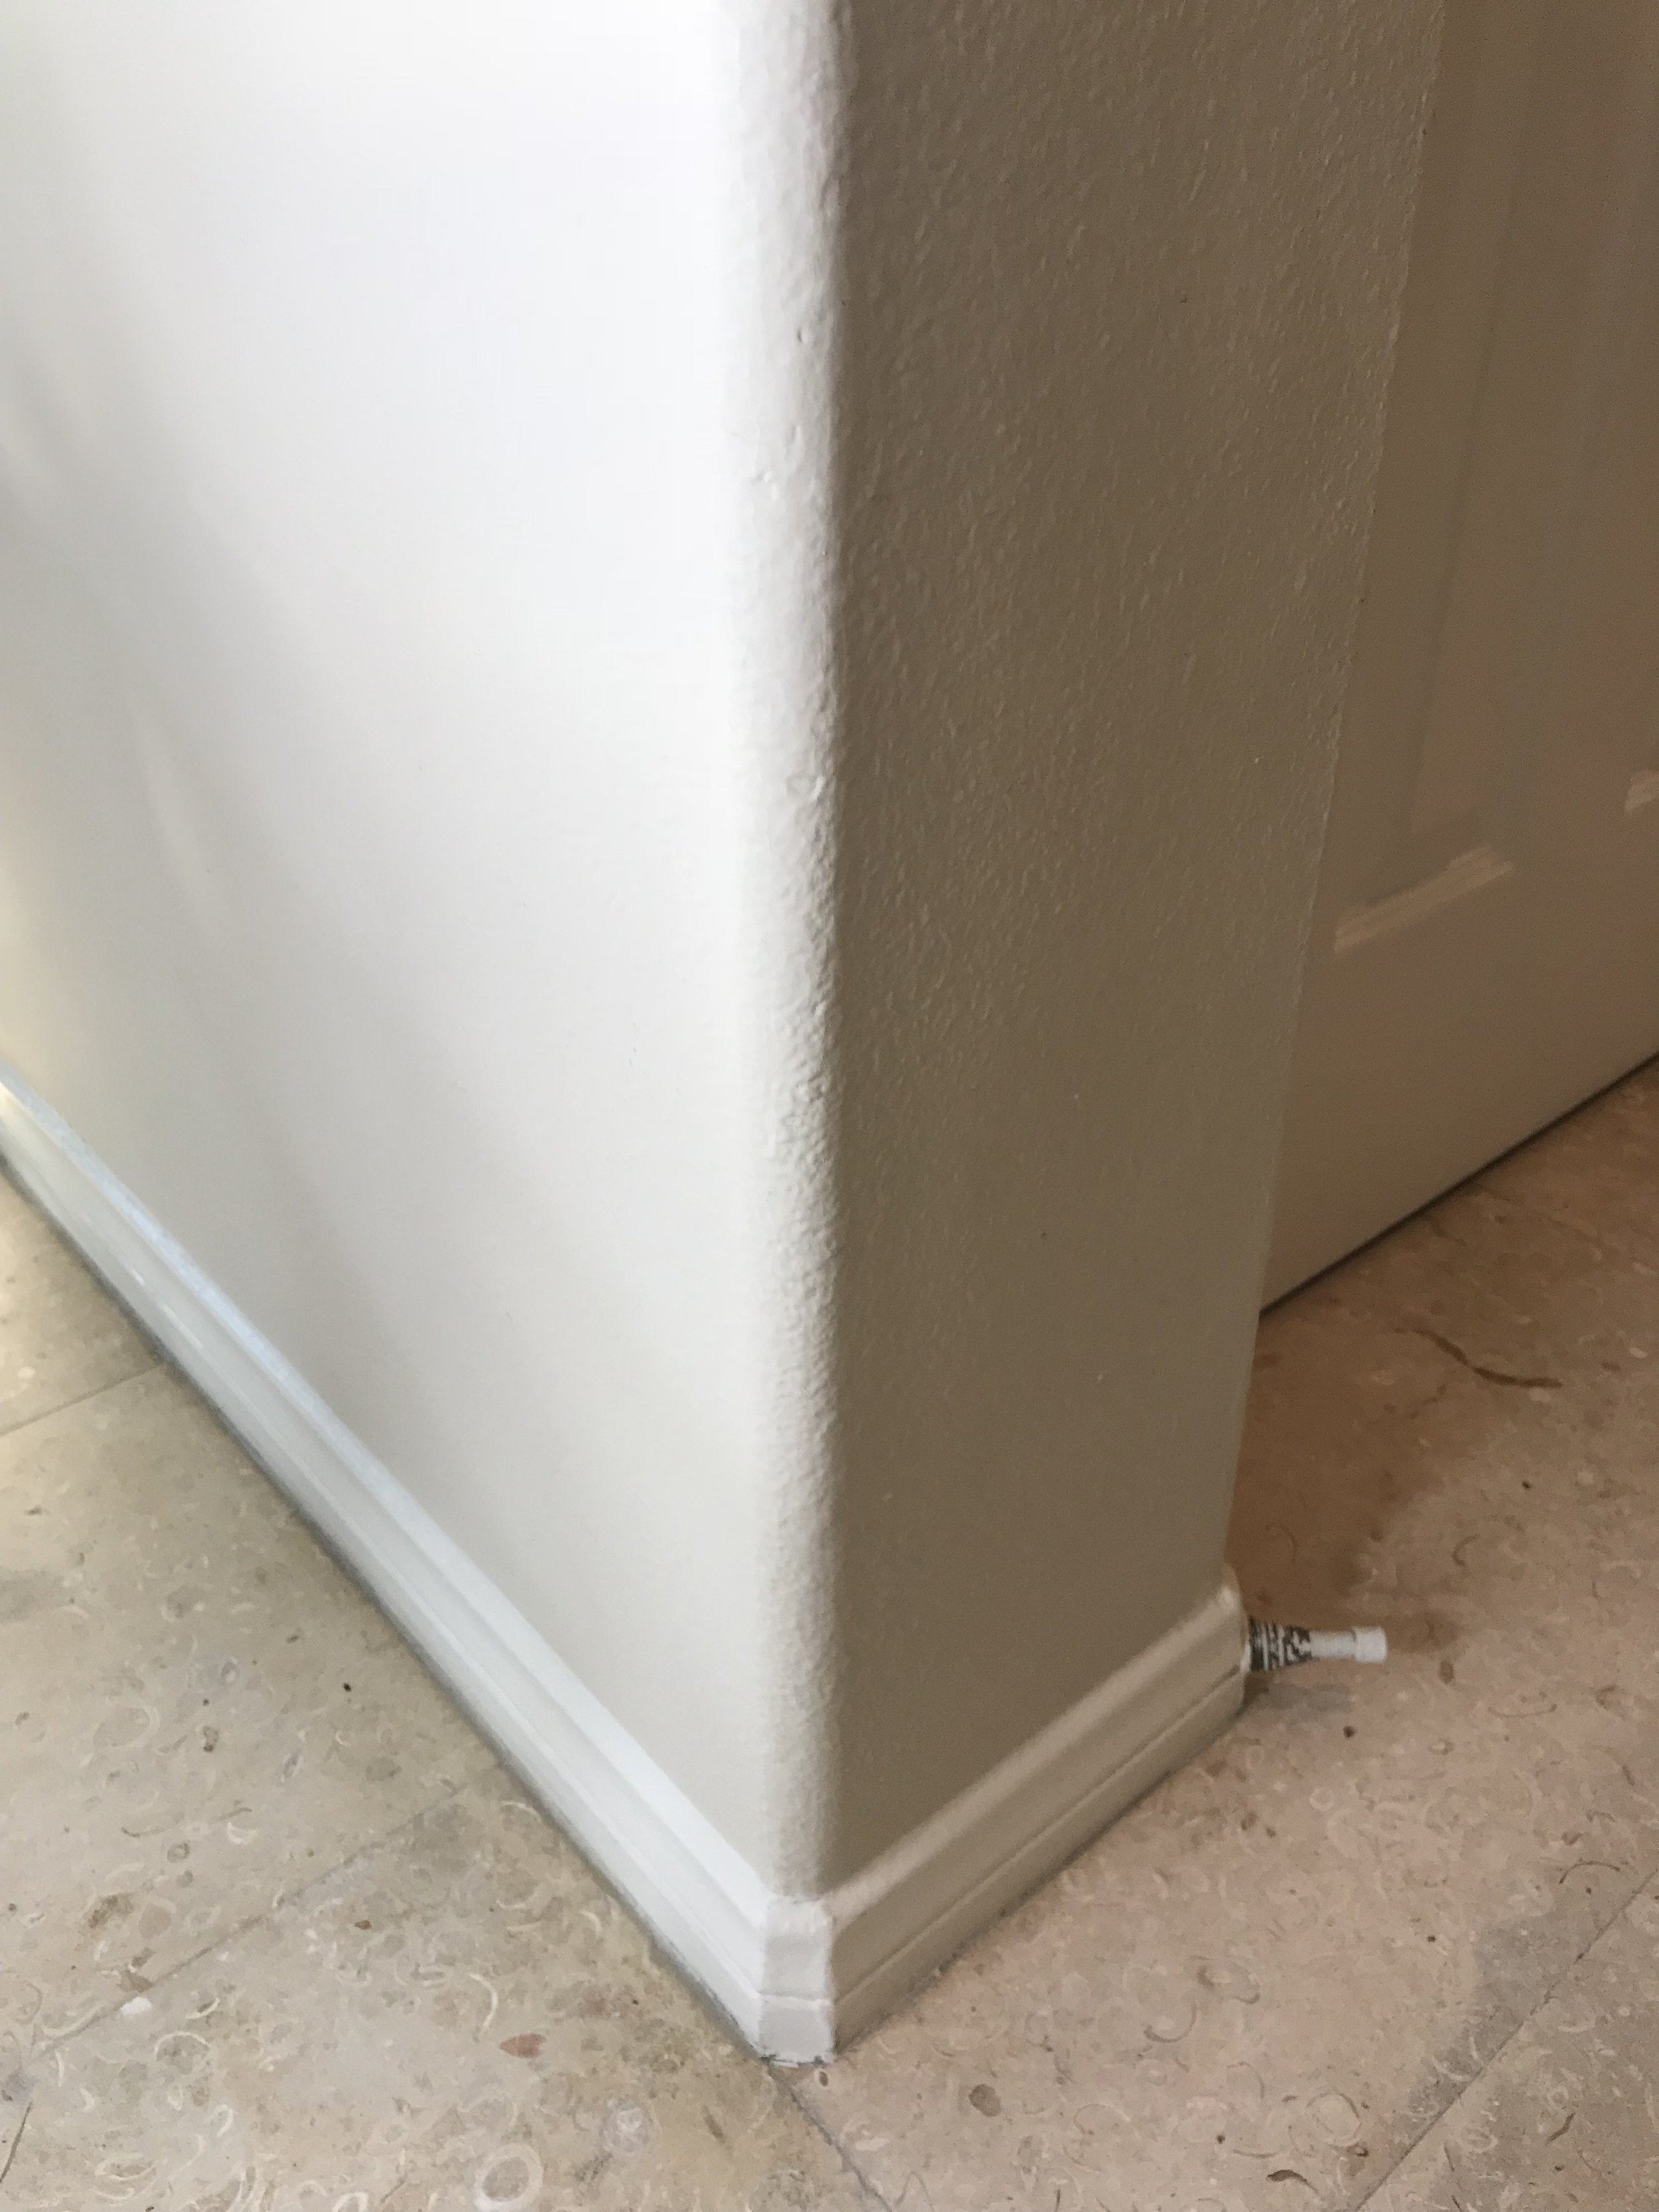 Wall After - Magic Eraser!